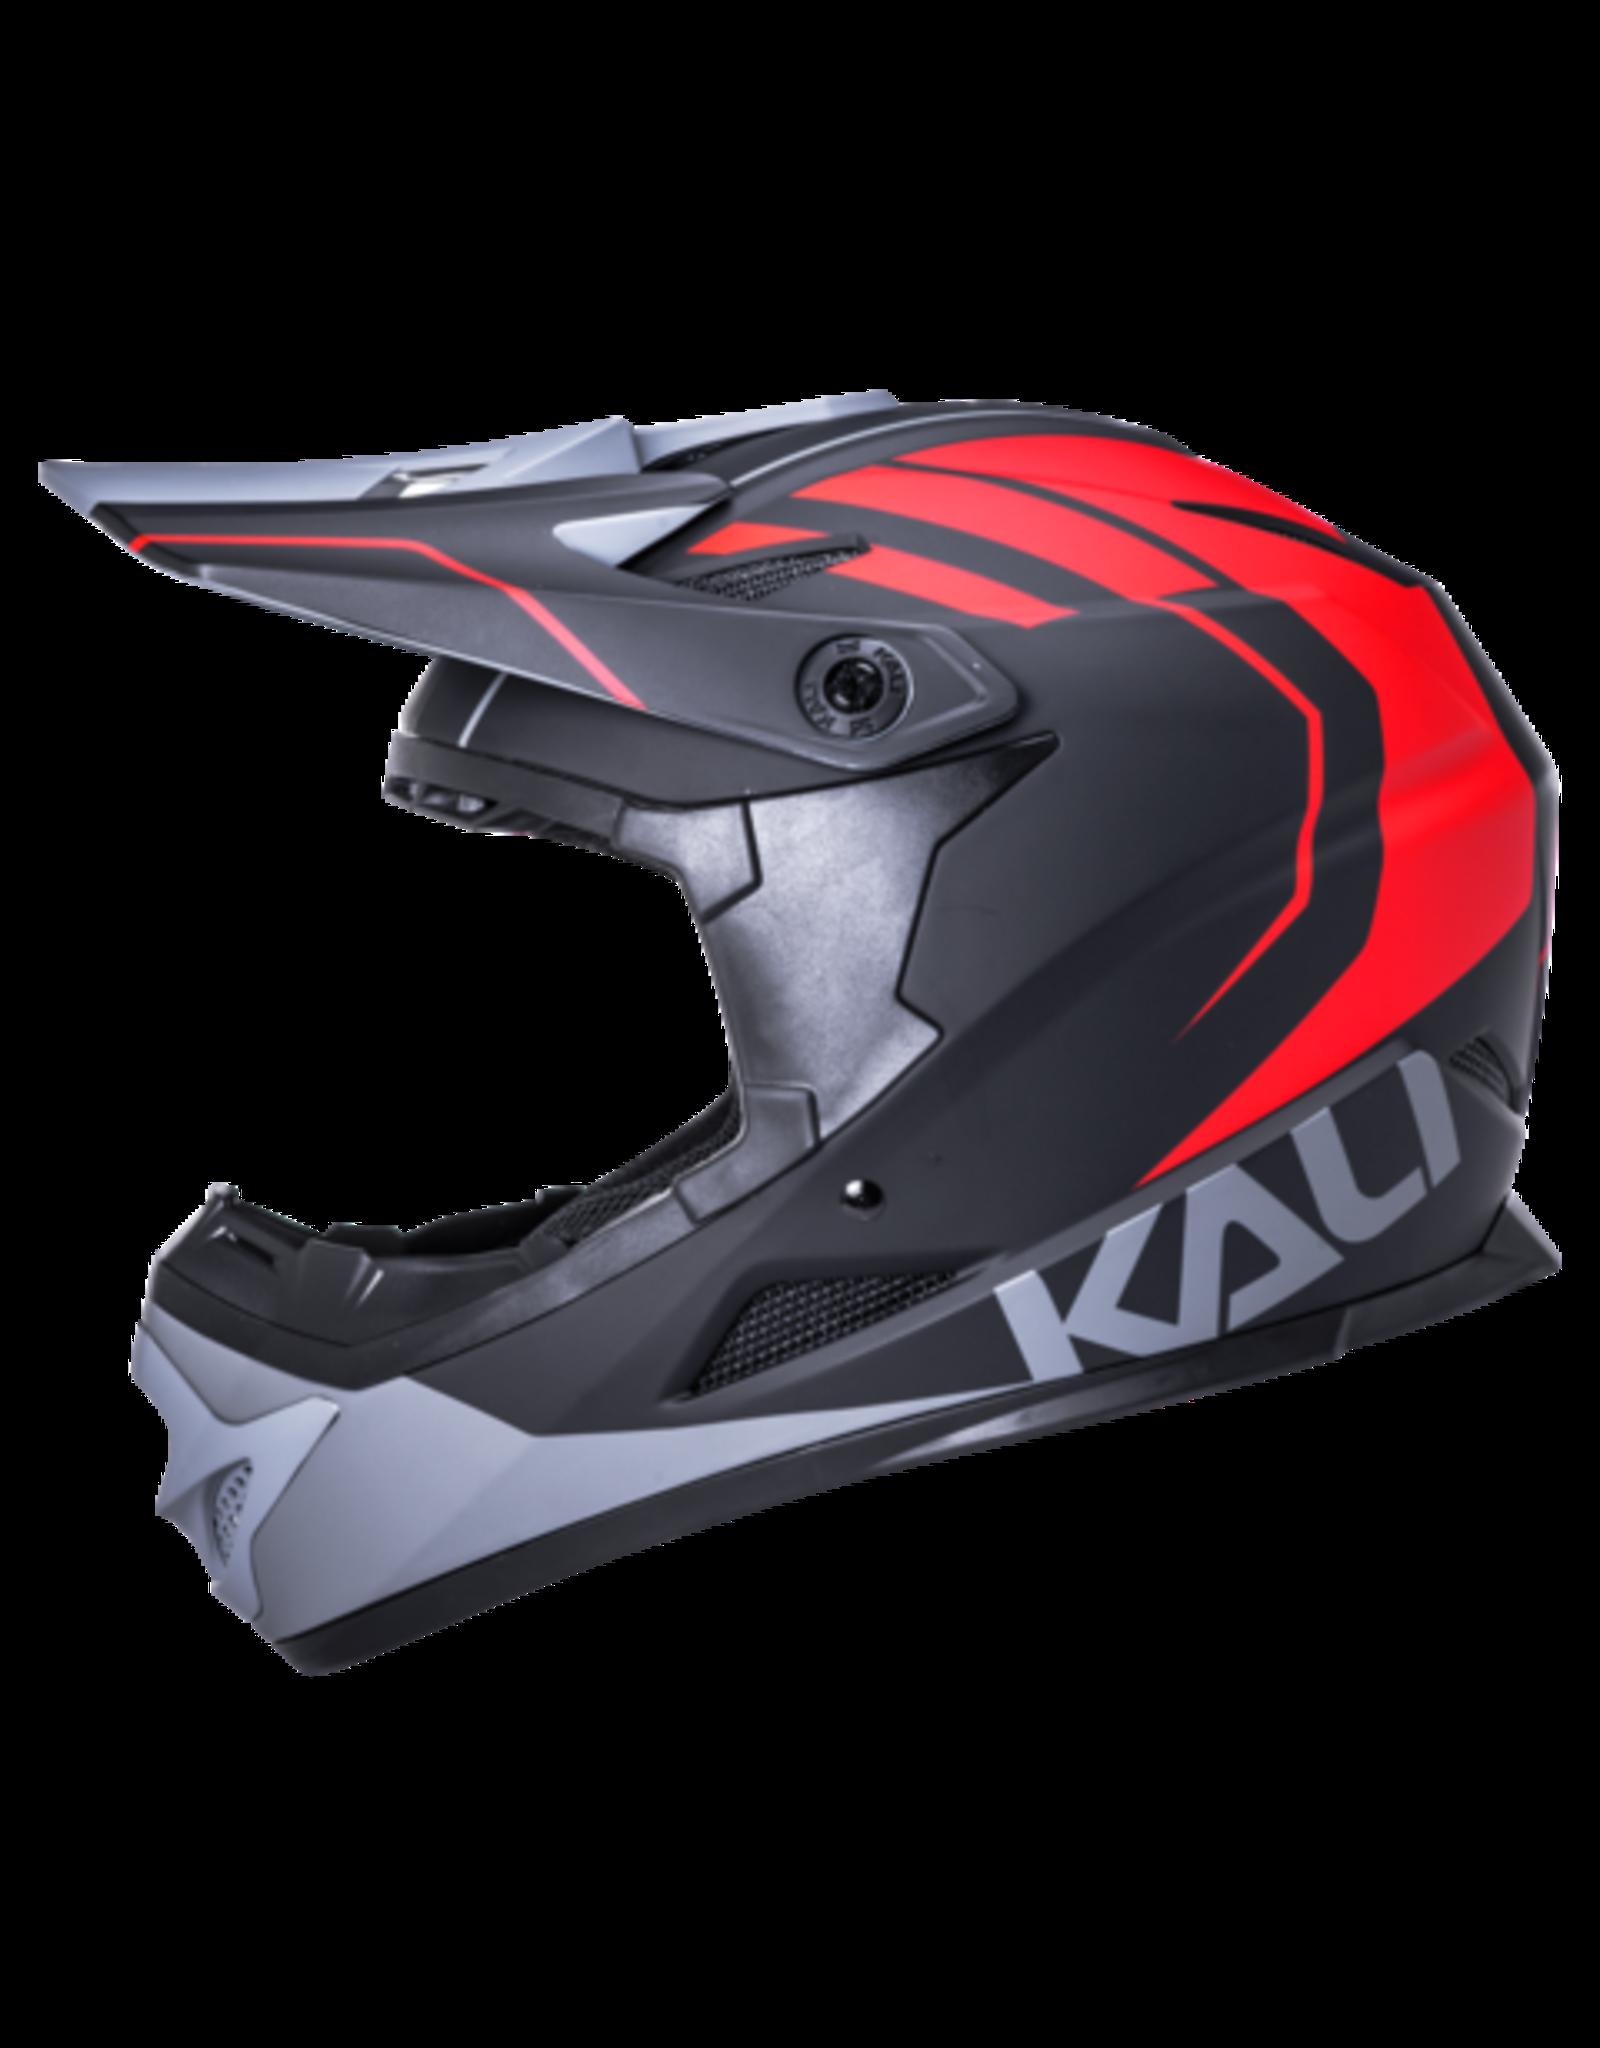 Kali Protectives Kali Protectives Zoka Full-Face Helmet - Black/Red/Gray, Small